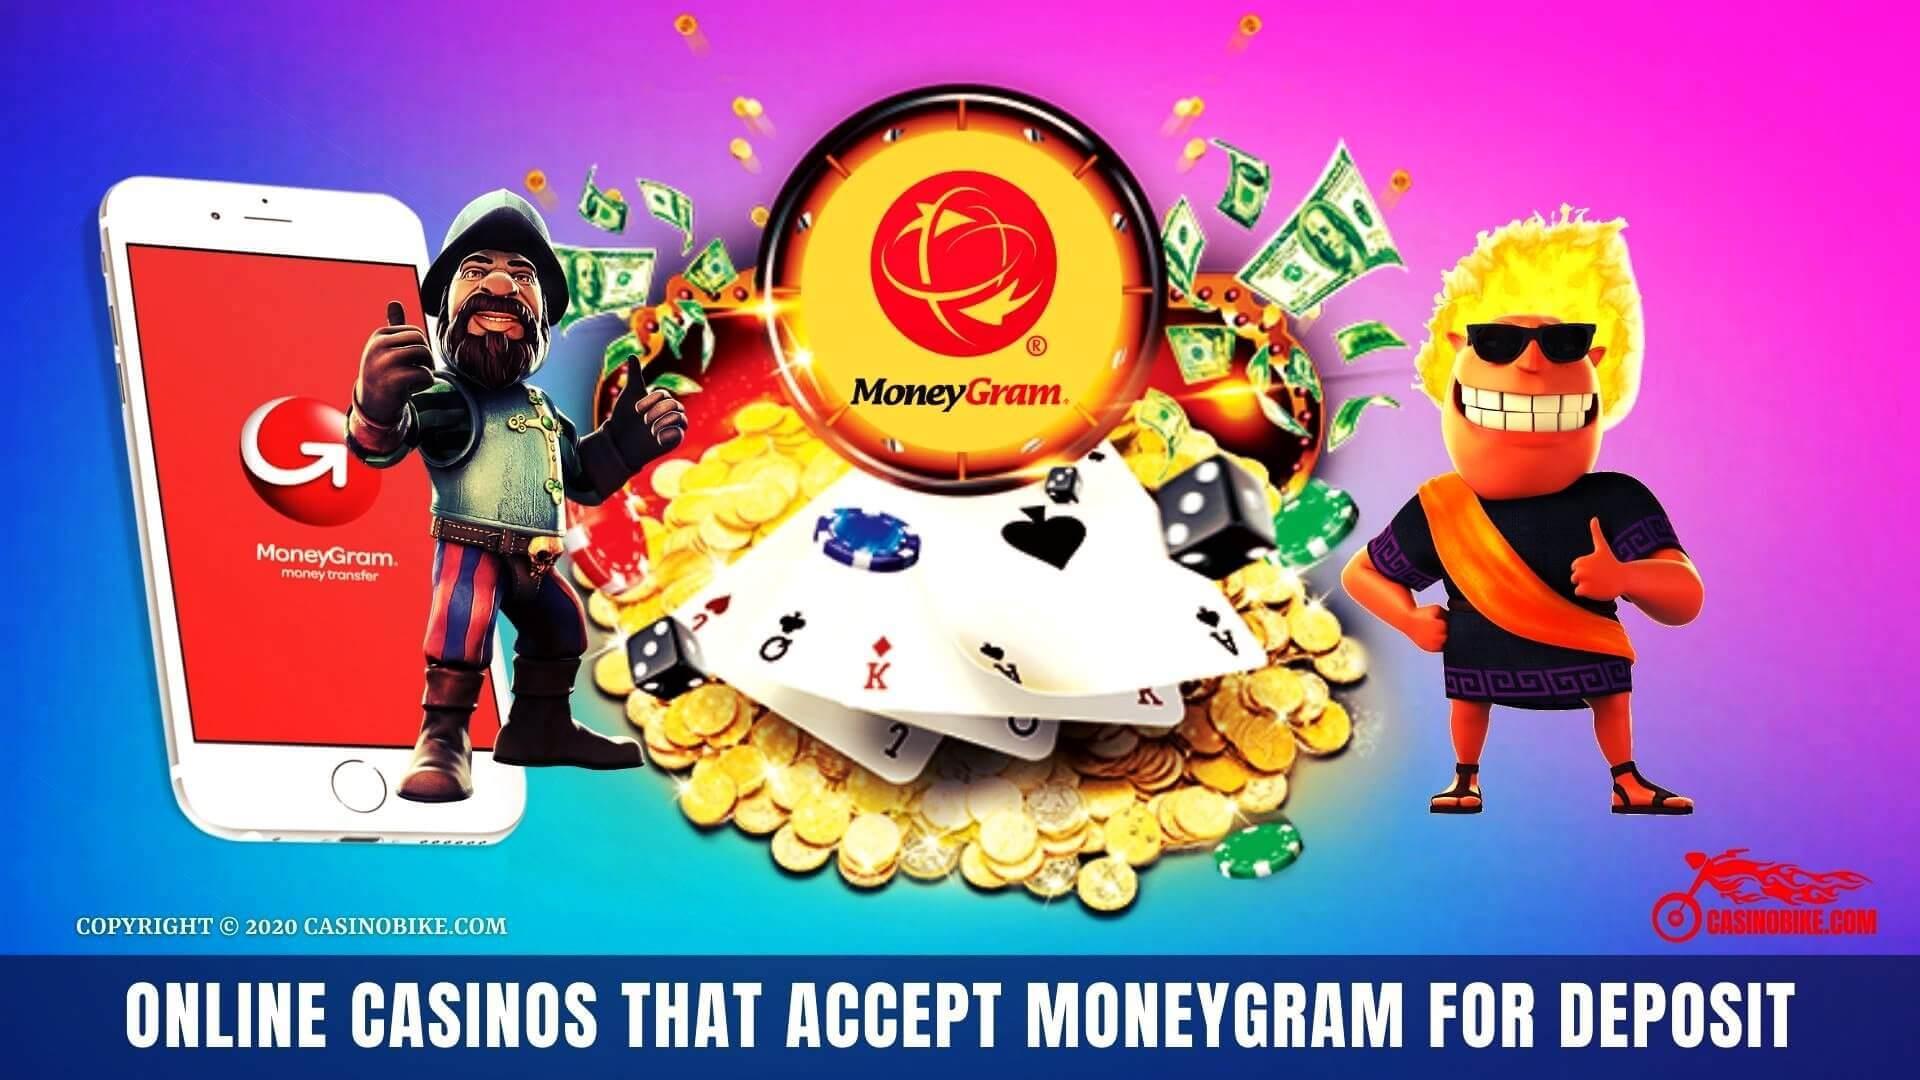 Online casinos that accept MoneyGram for deposit